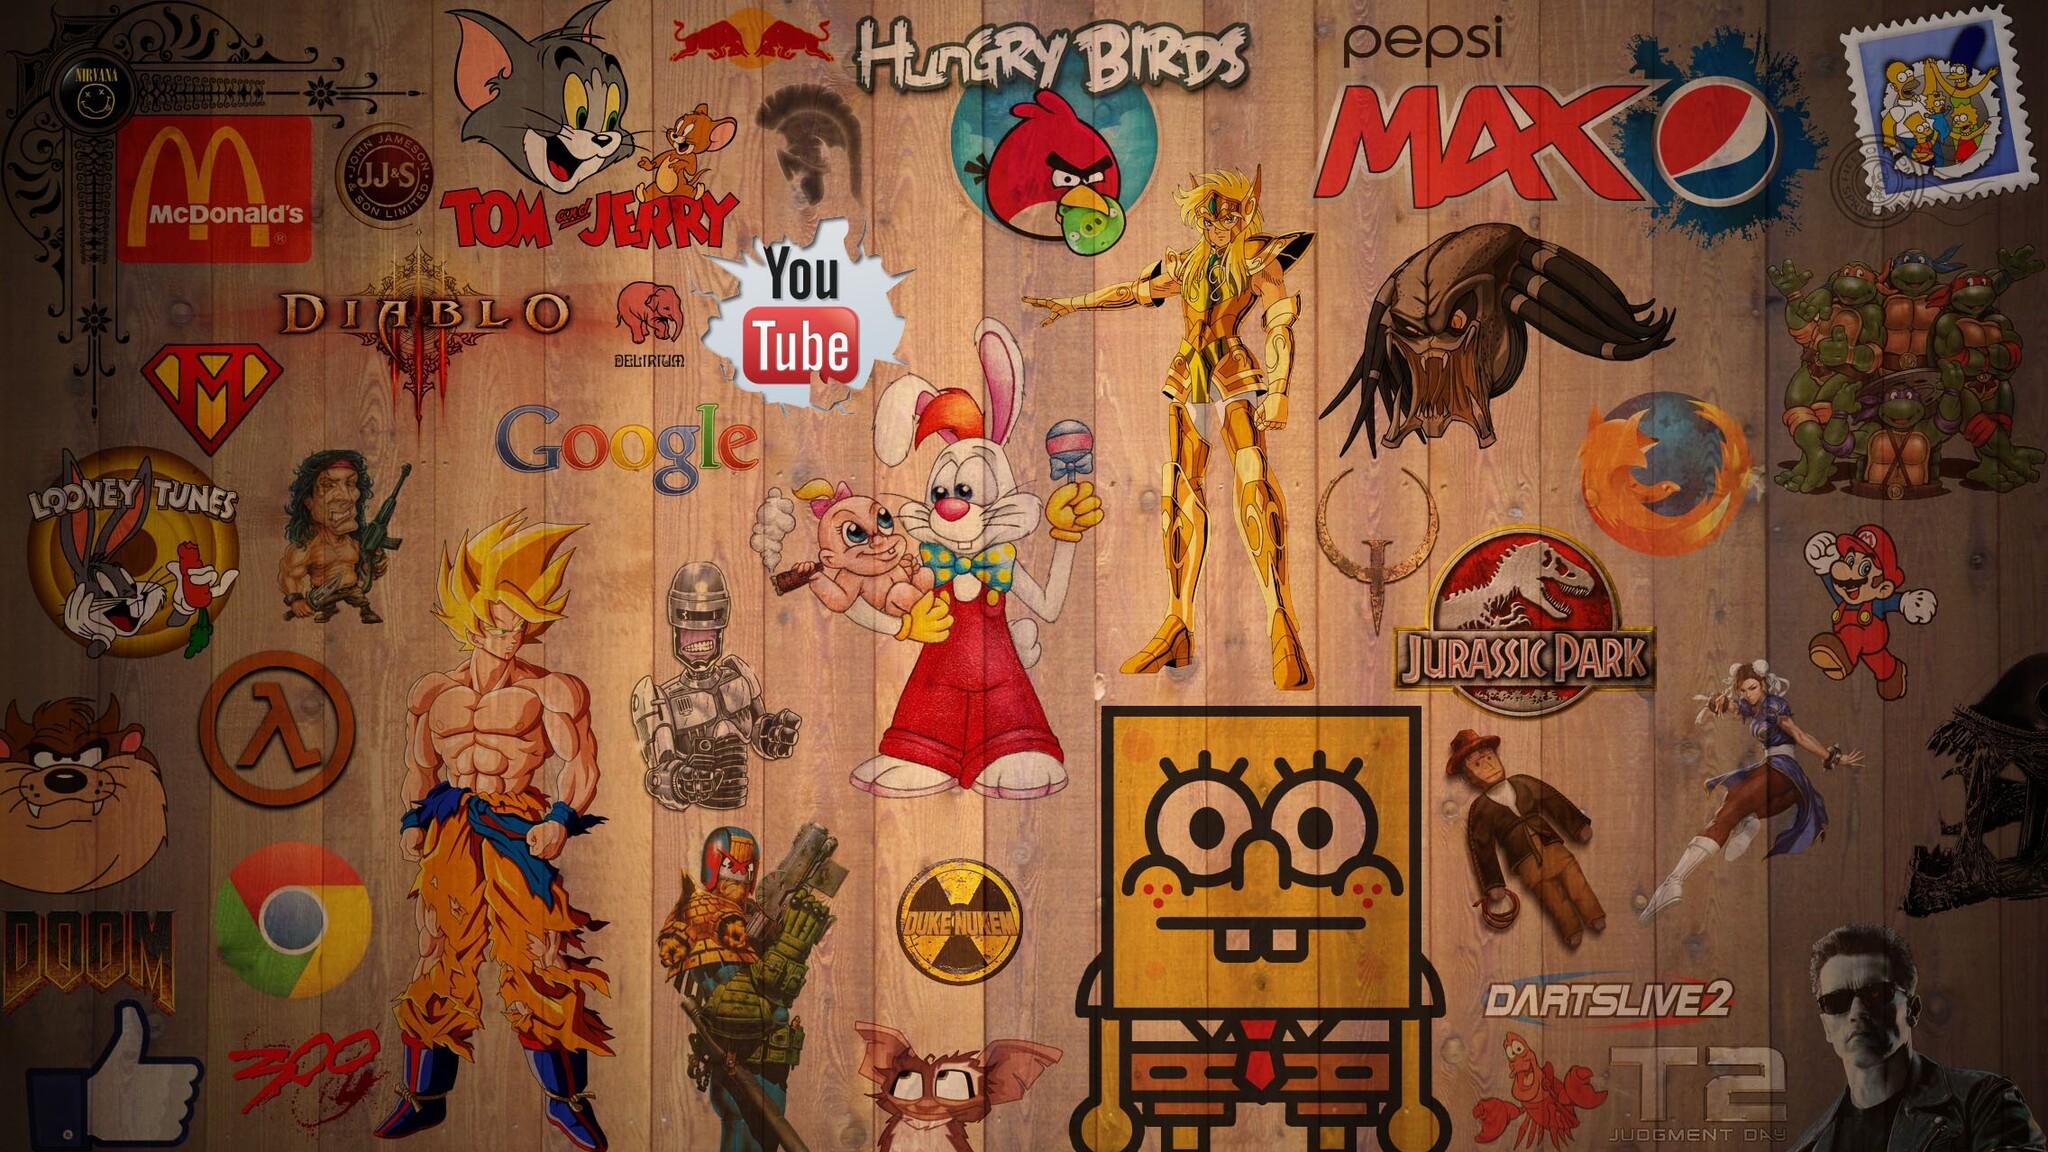 2048x1152 Cartoons 2048x1152 Resolution Hd 4k Wallpapers